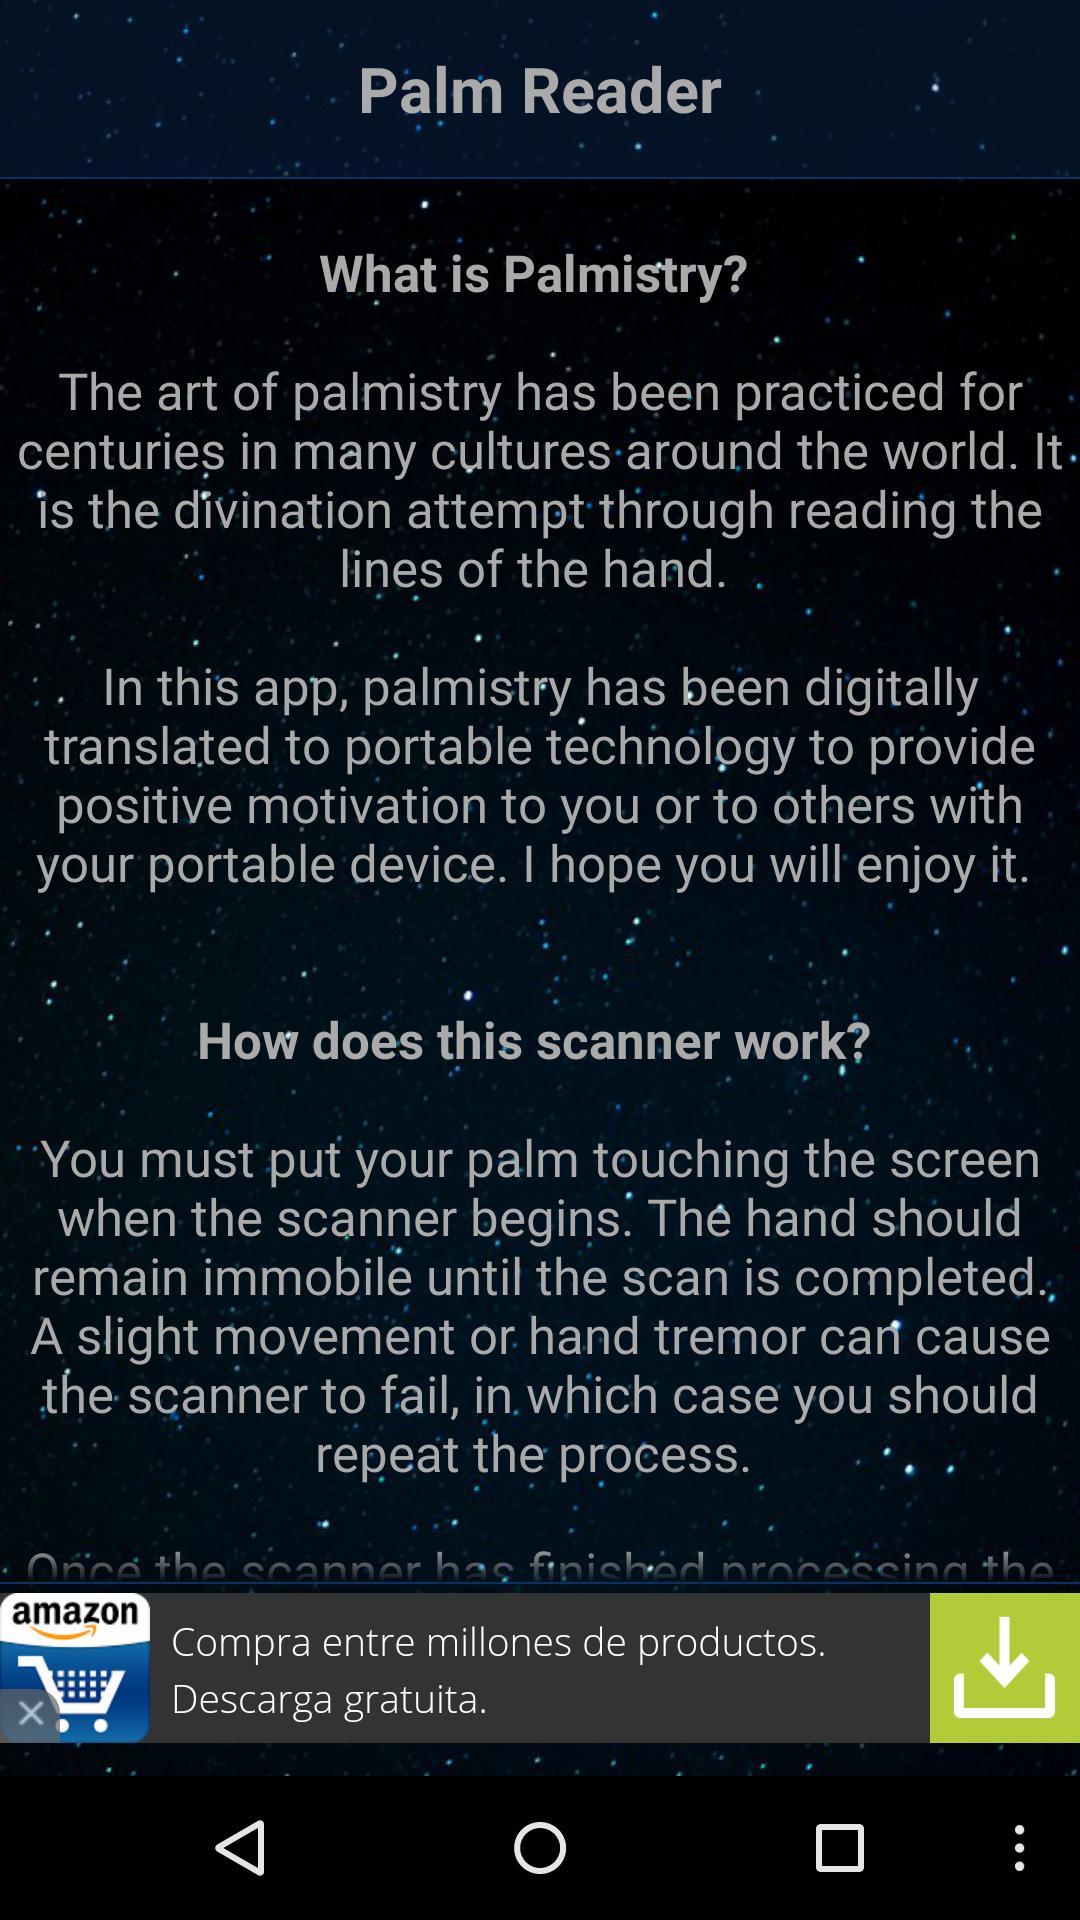 Palm Reading Scanner Palmistry Joke For Android Apk Download